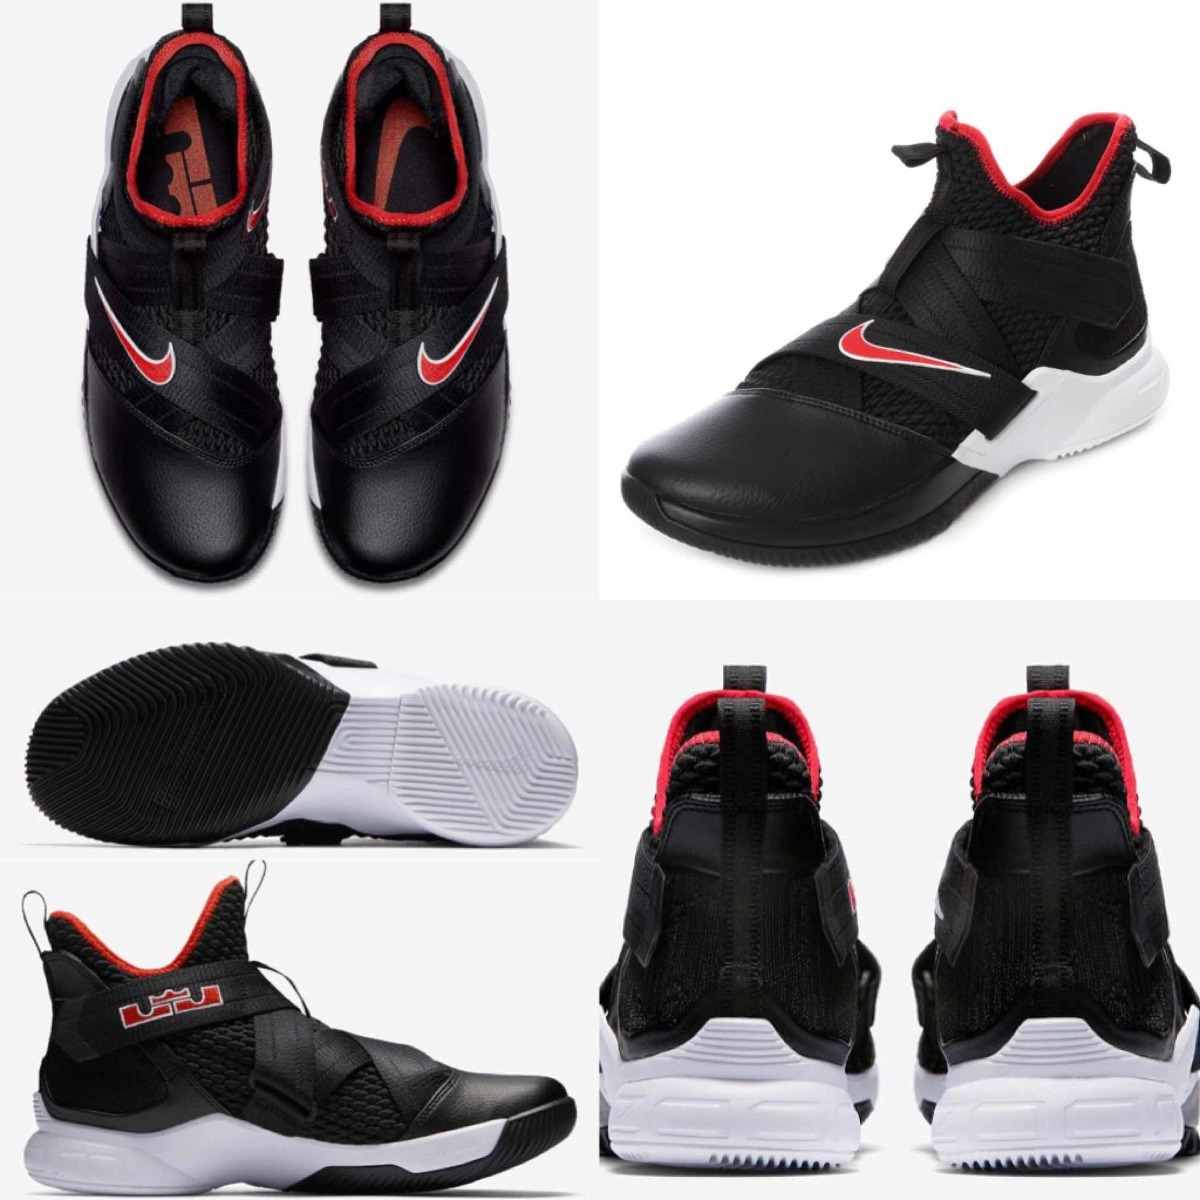 finest selection a114a 52051 Tenis Nike Básquet Lebron Soldier Xii Negro #5 Al #11 Mx